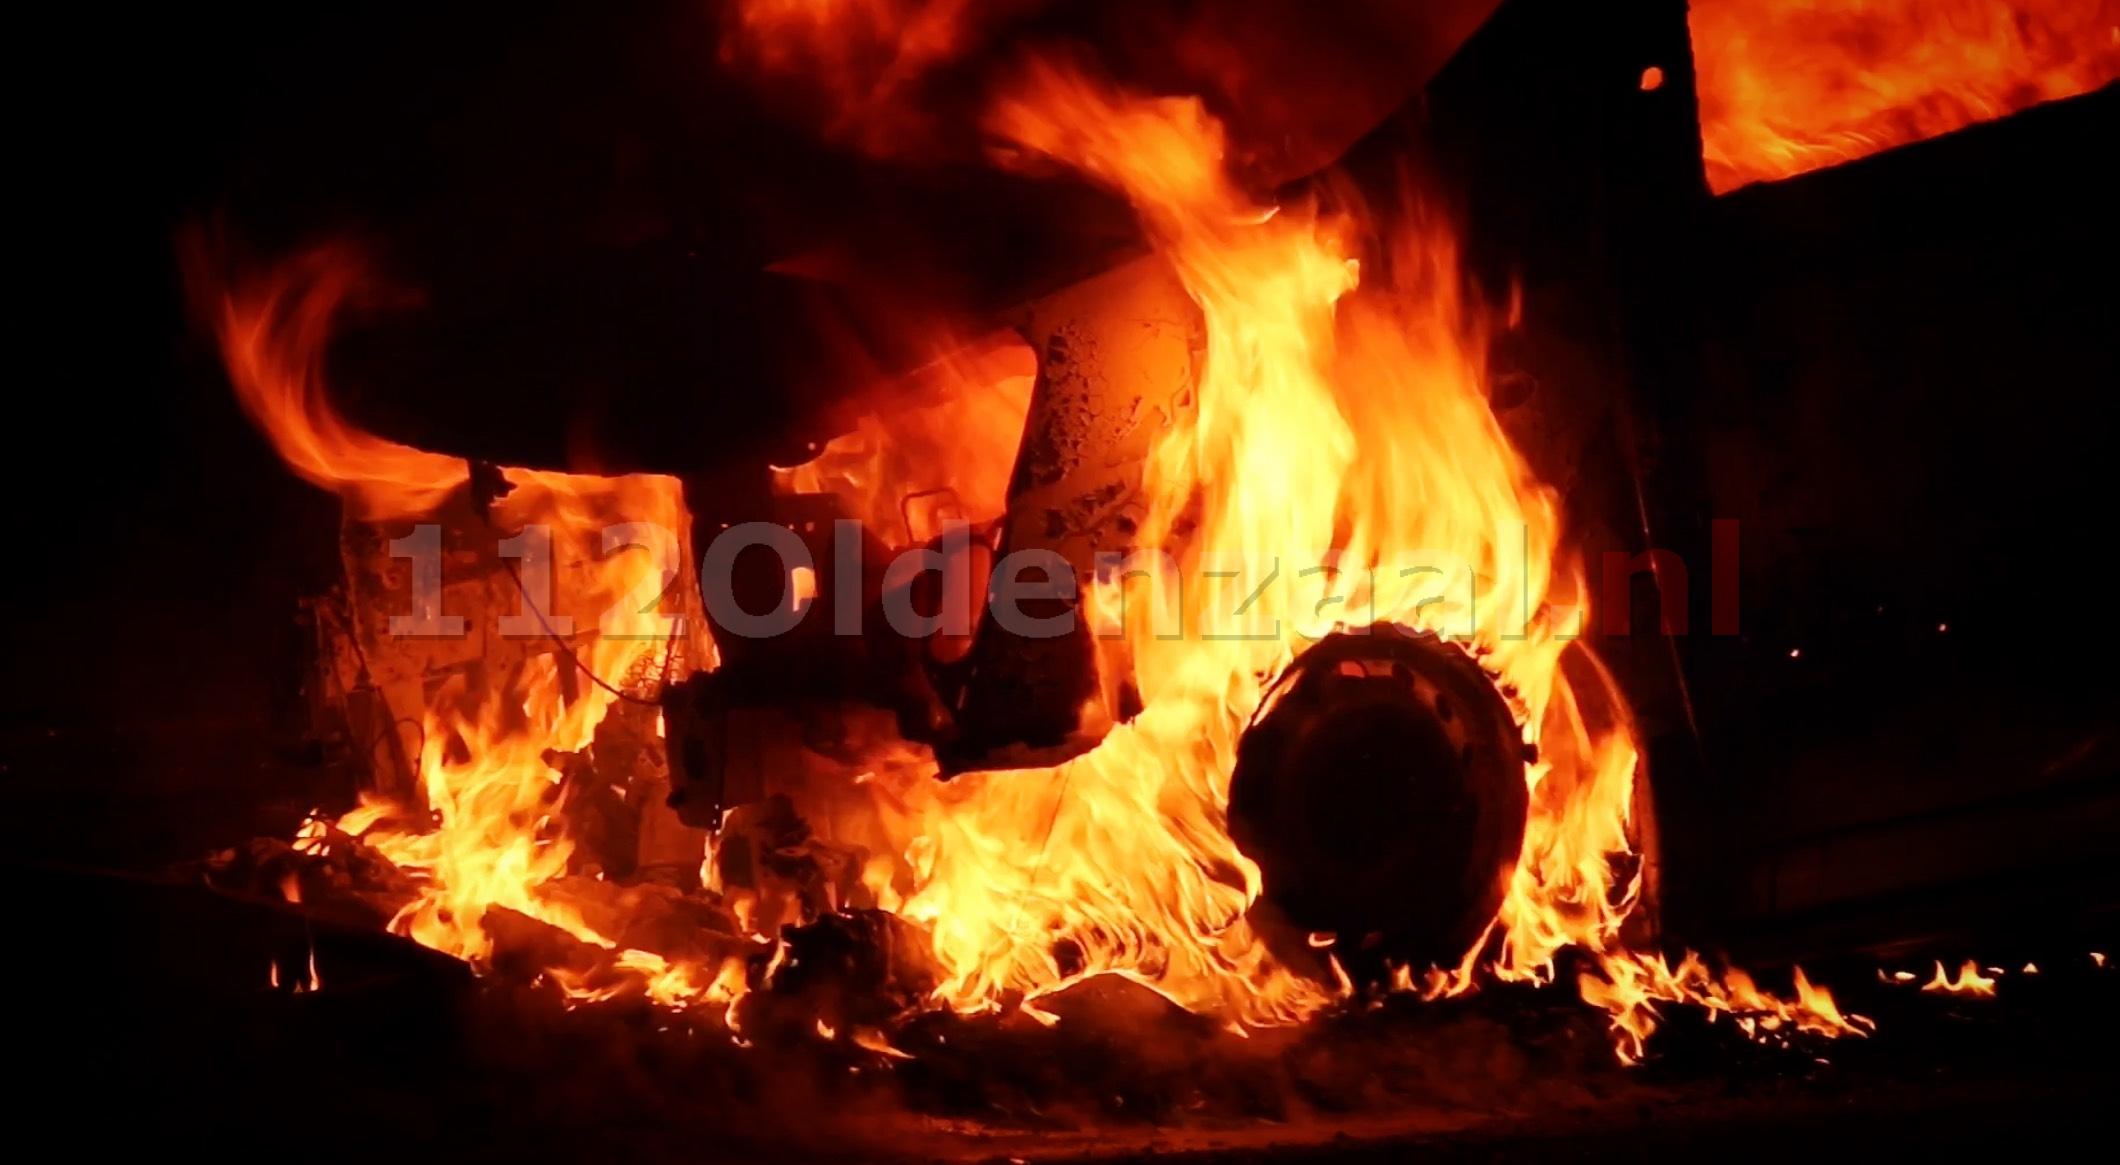 Foto: Busje volledig verwoest na brand op parkeerplaats langs A1 bij Deurningen